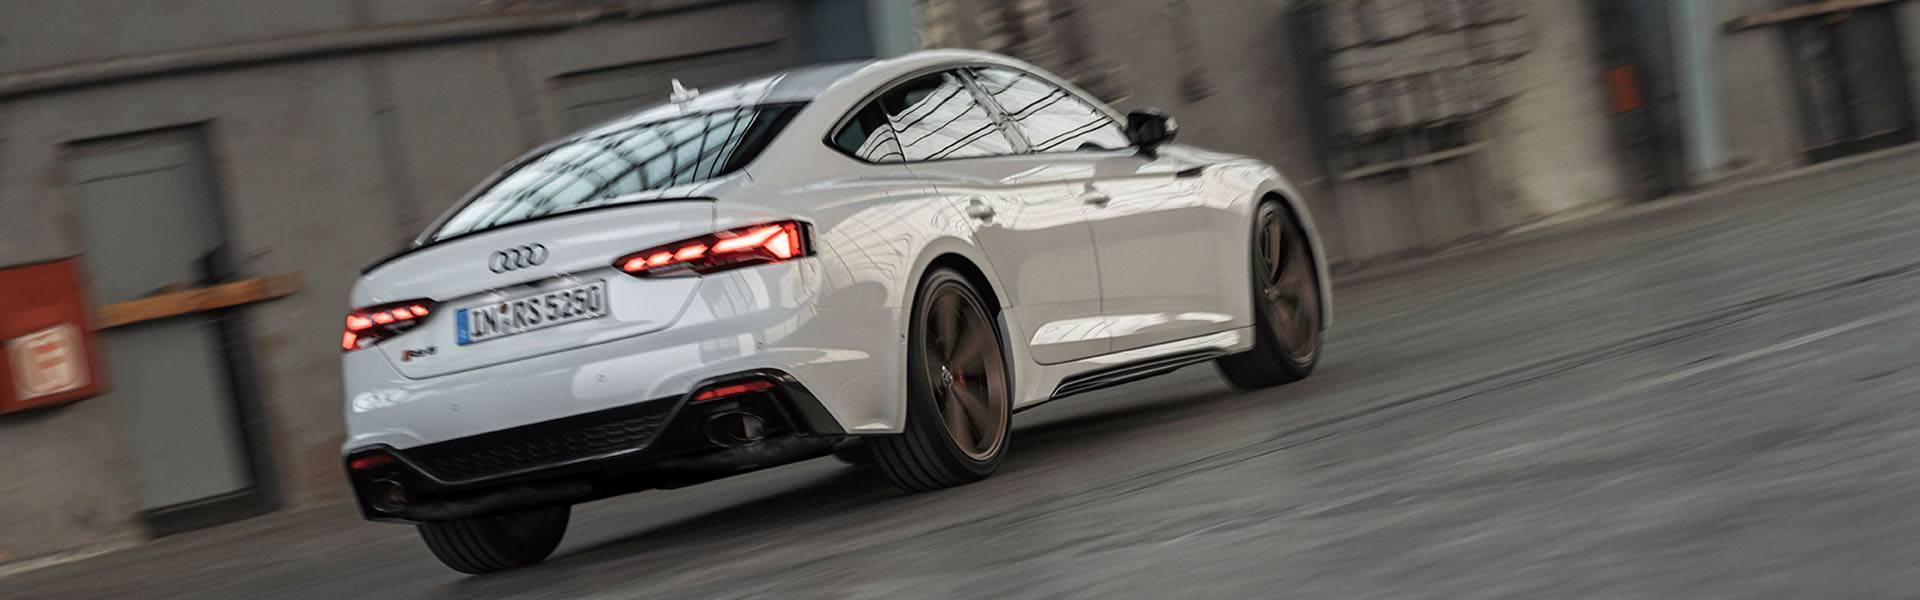 2021 RS 5 Sportback Lifestyle Image